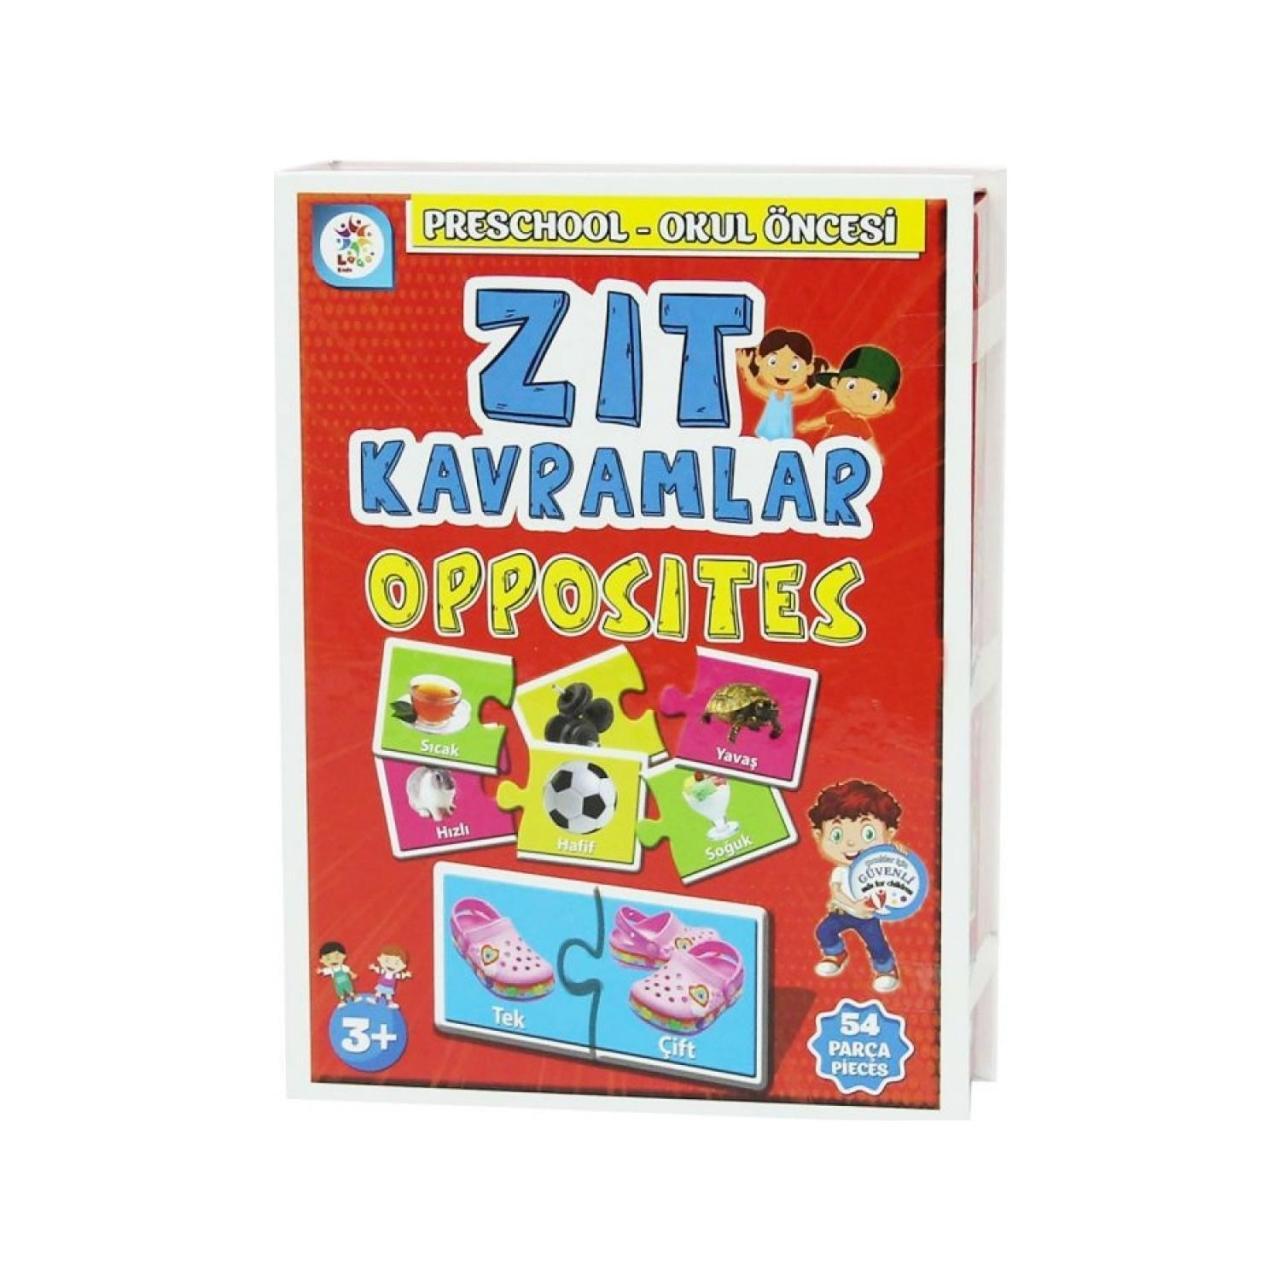 Laco Kids Zit Kavramlar Opposites Okul Oncesi Oyun Seti 54 Parca